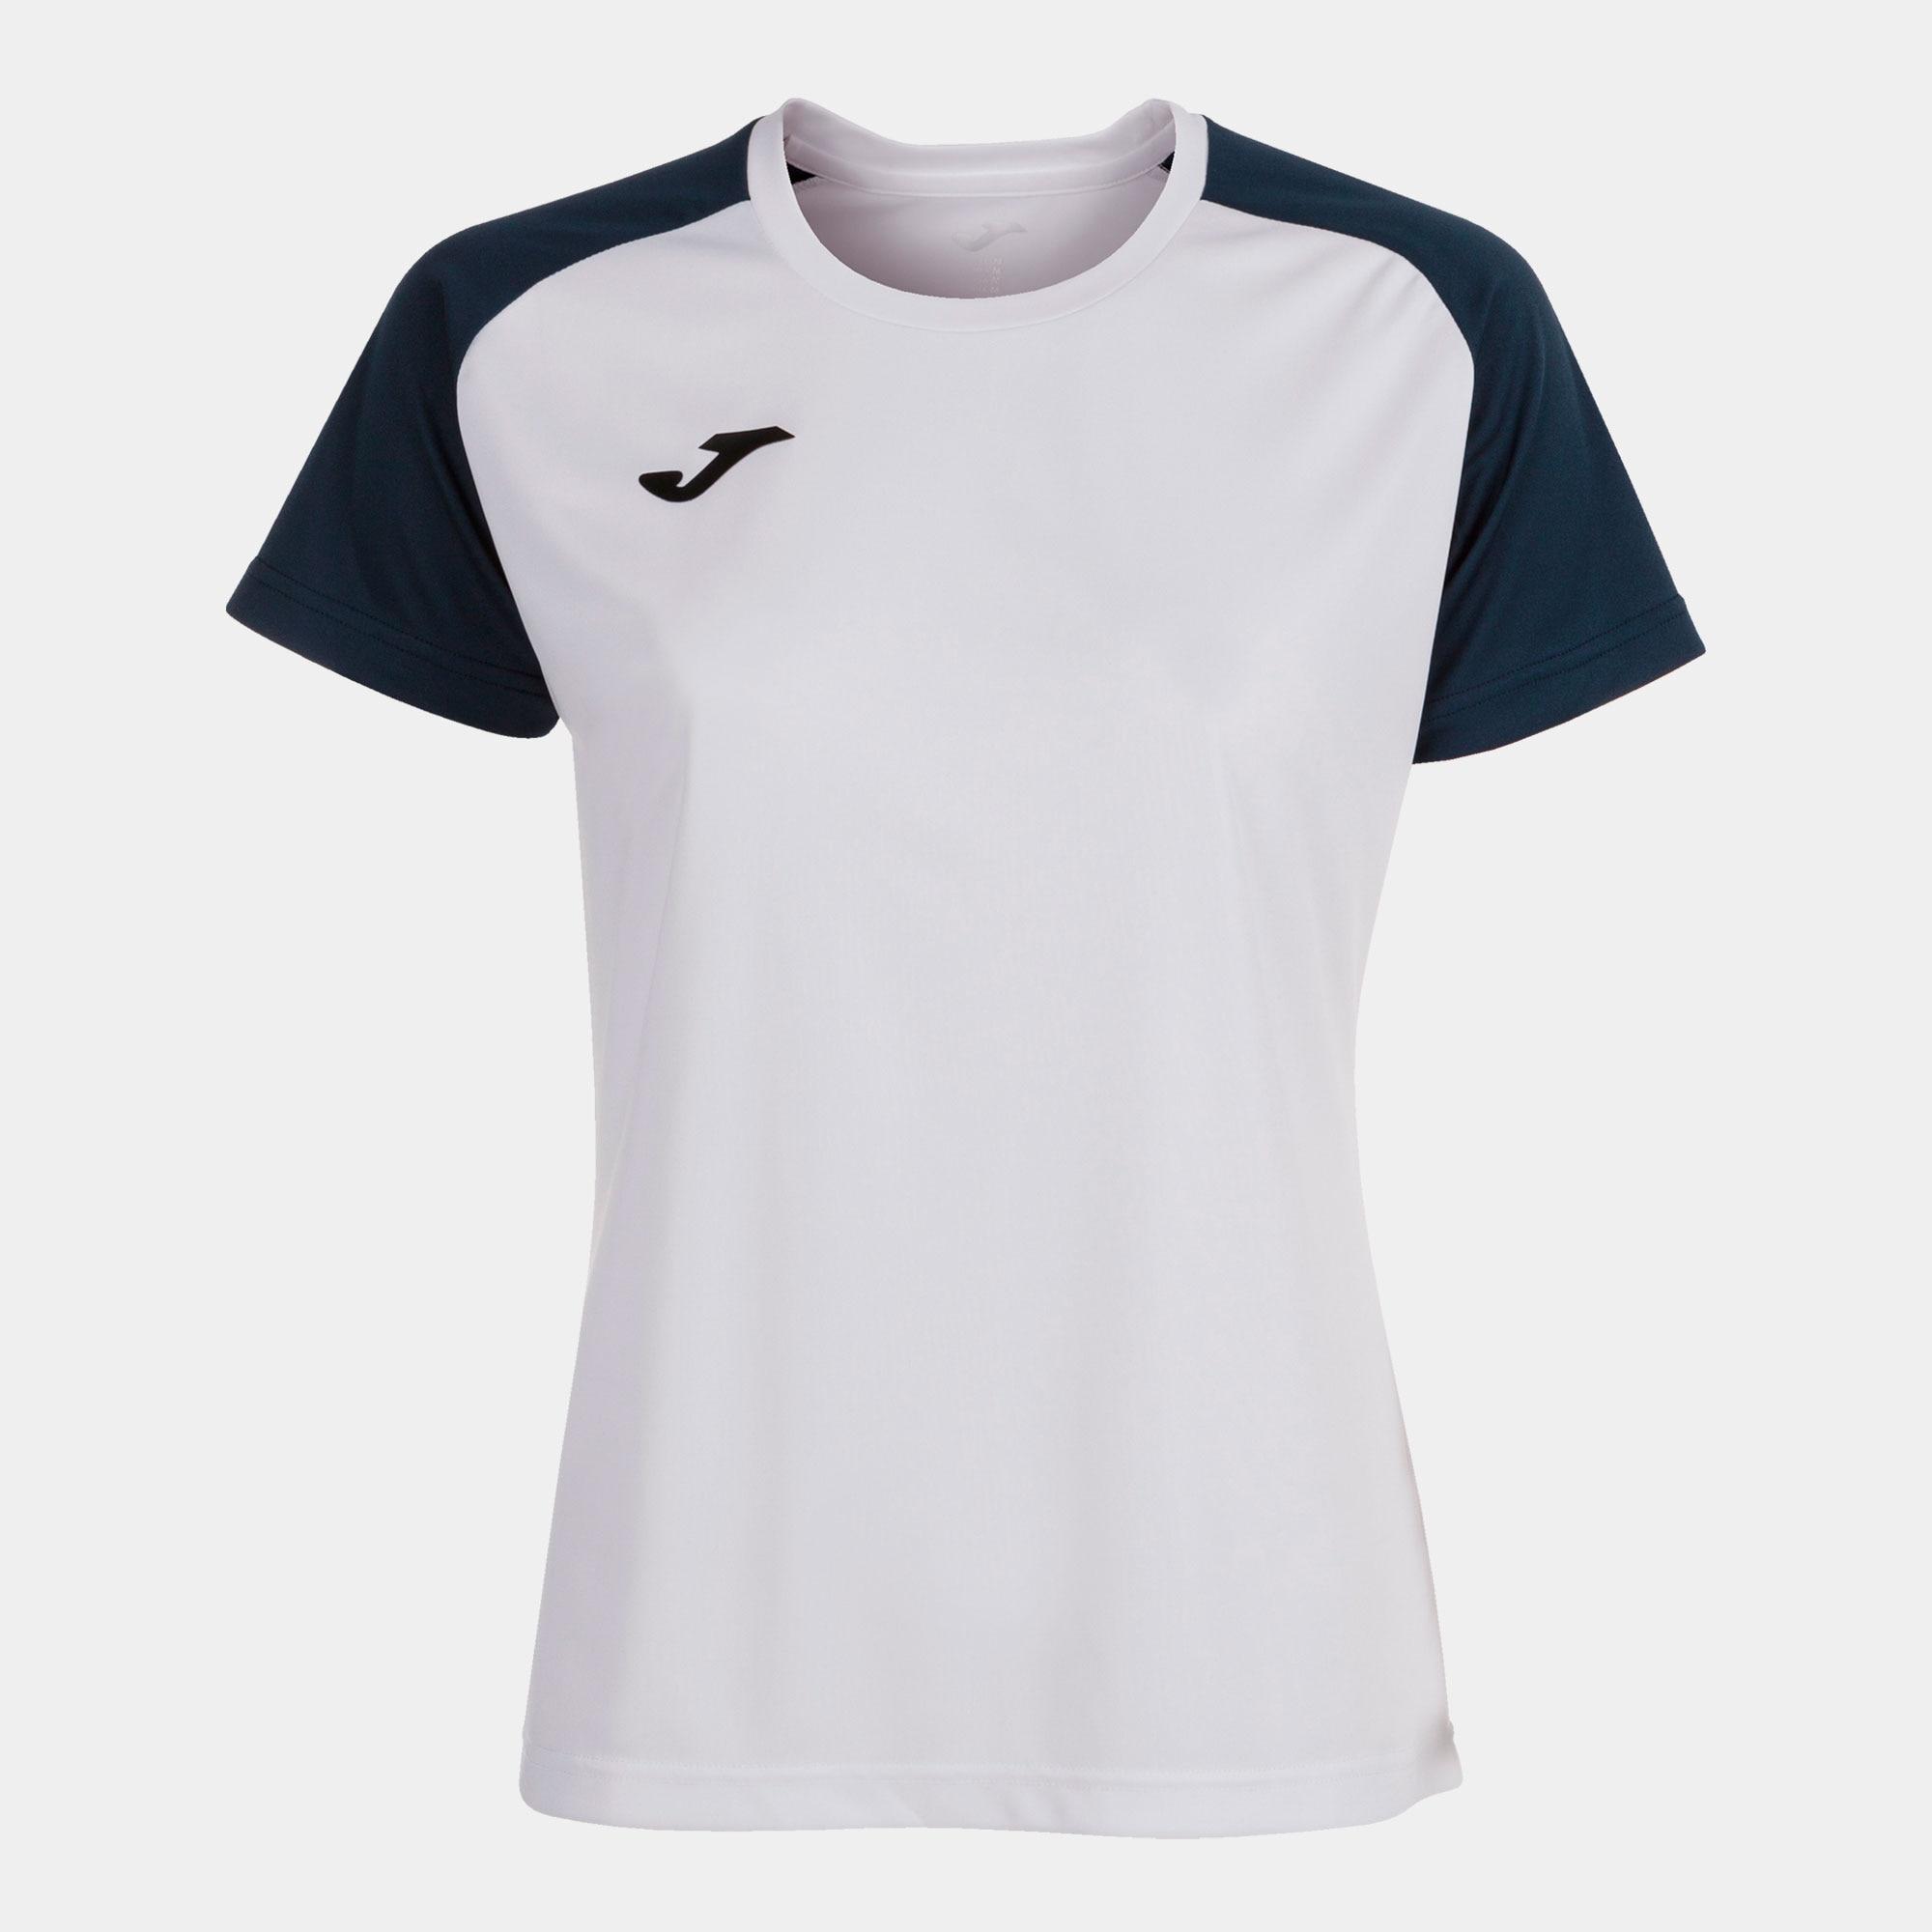 Camiseta manga corta Academy IV para mujer